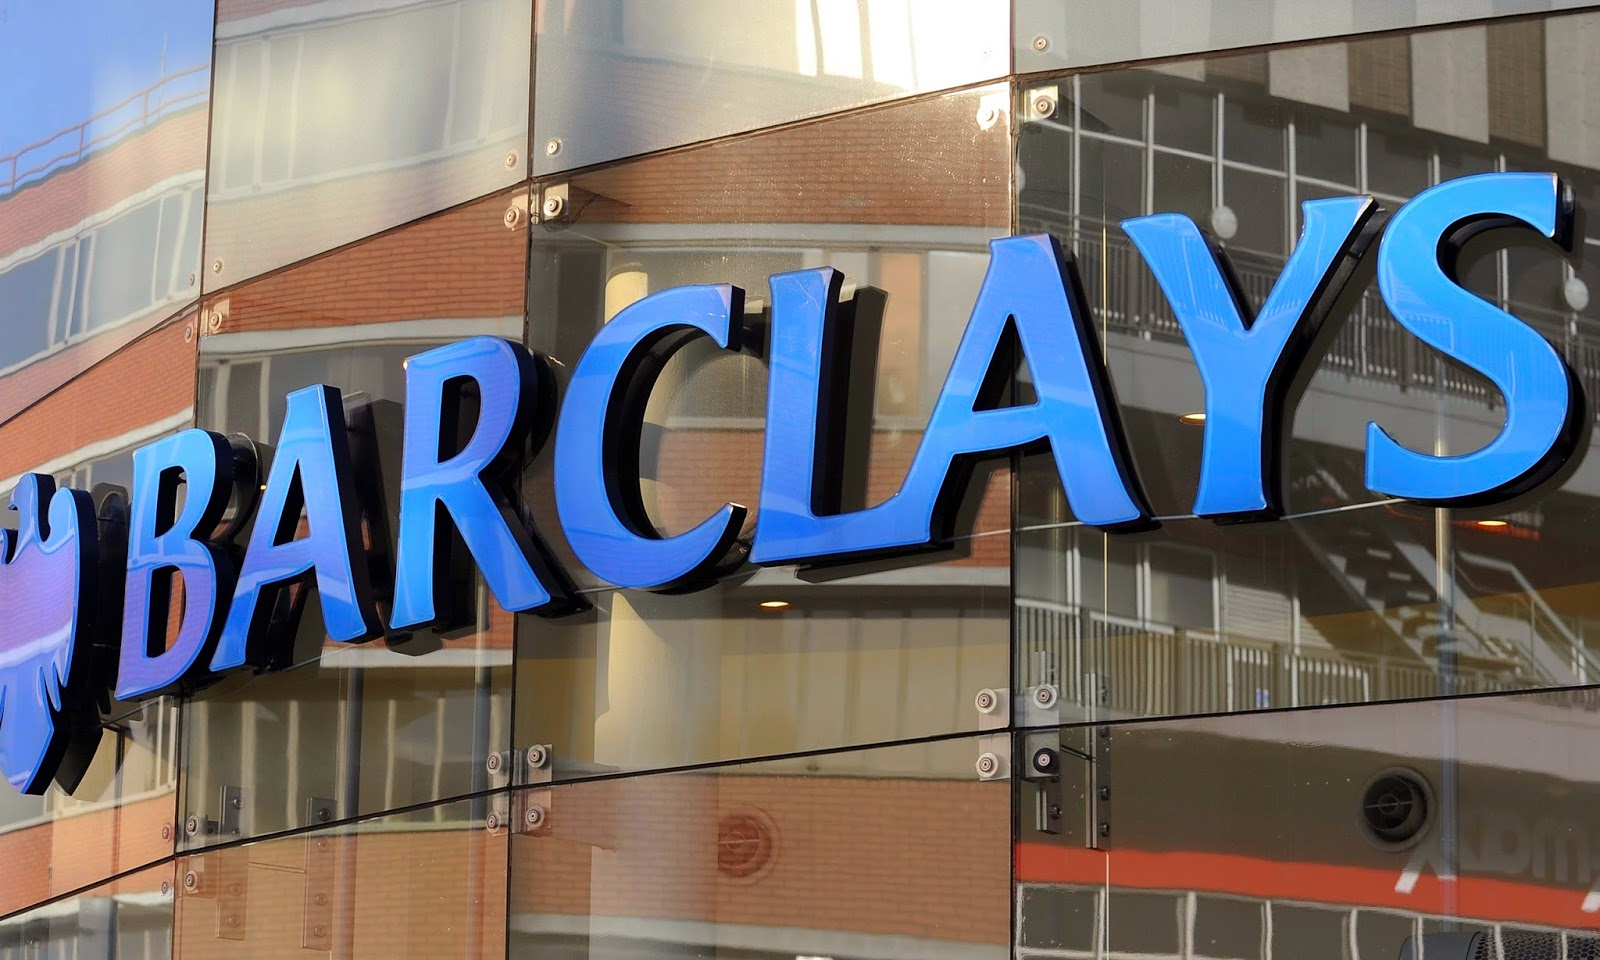 Finabiz: Barclays sells Spanish businesses